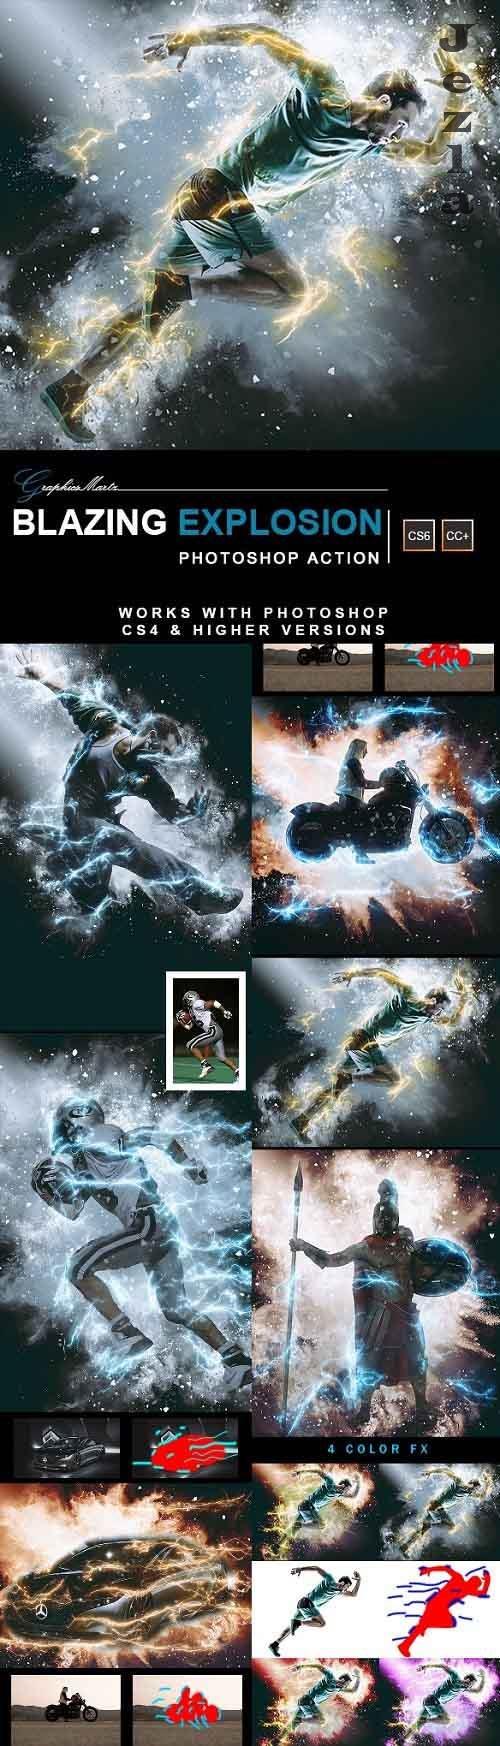 Blazing Explosion Photoshop Action 28269901